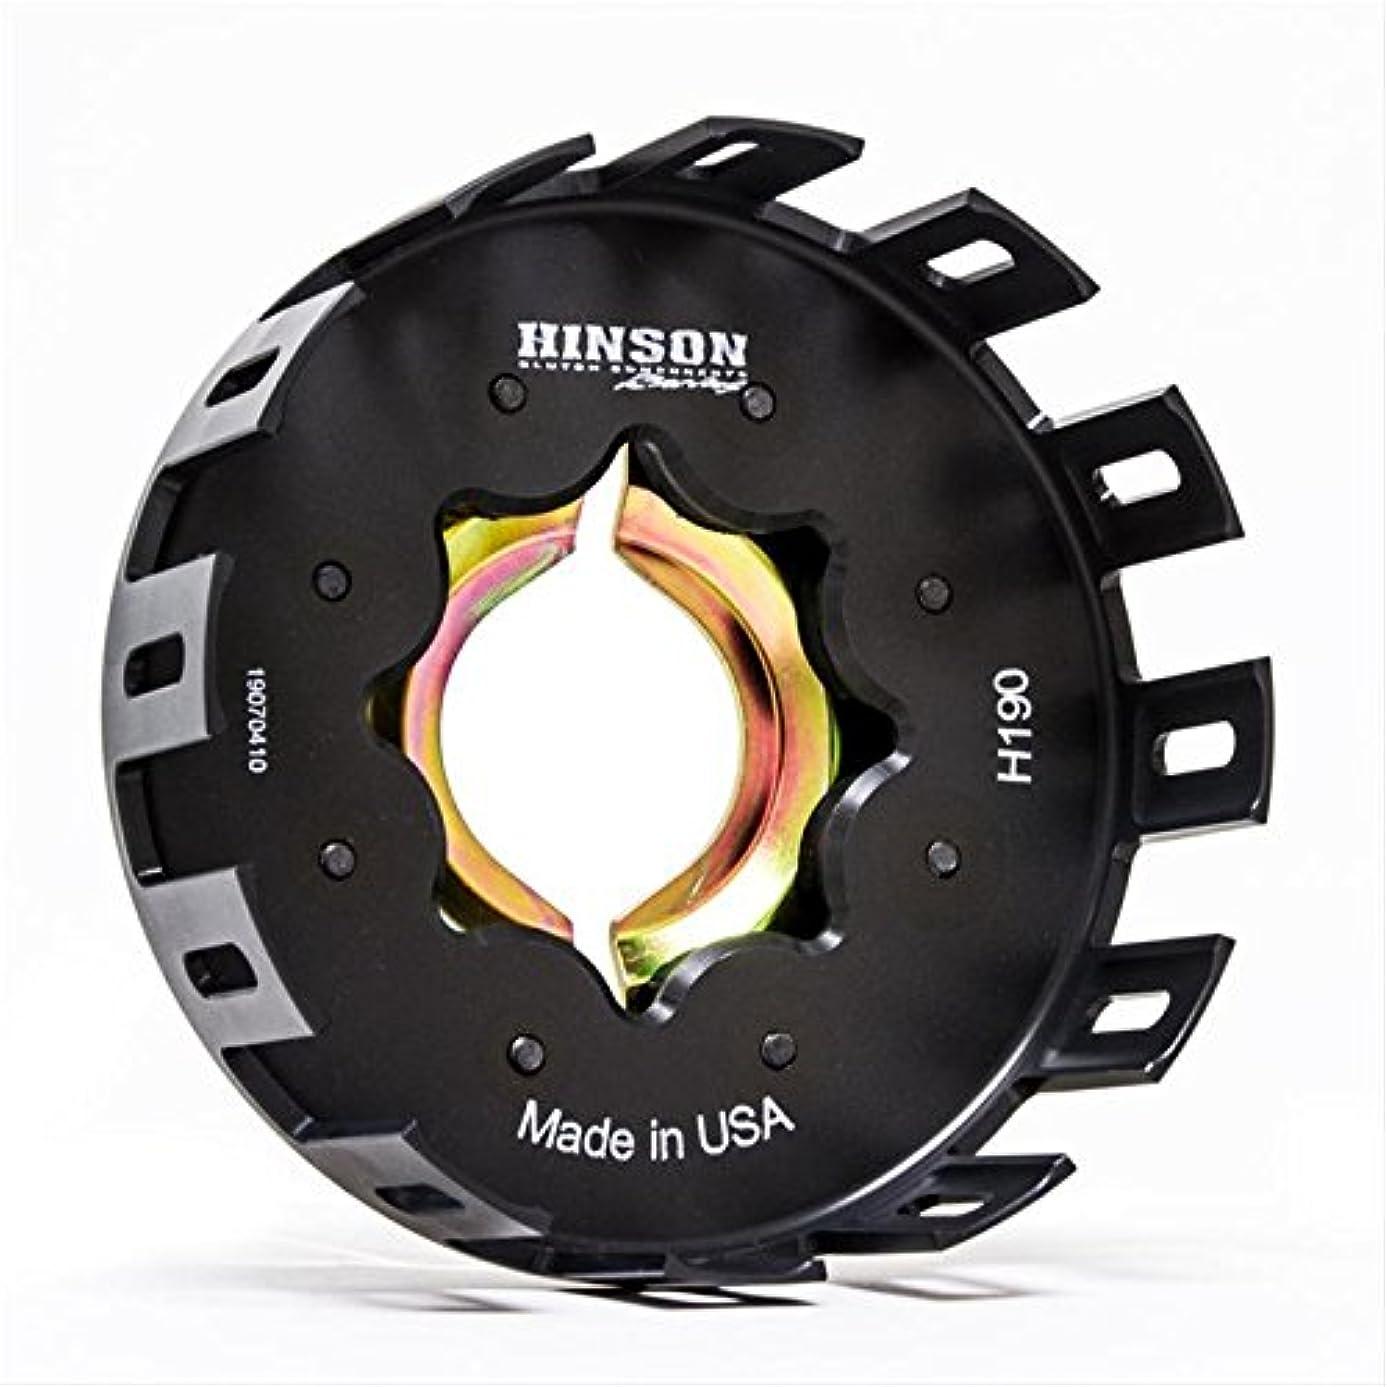 Hinson?Clutch?Components H190 Billet-Proof Clutch Basket